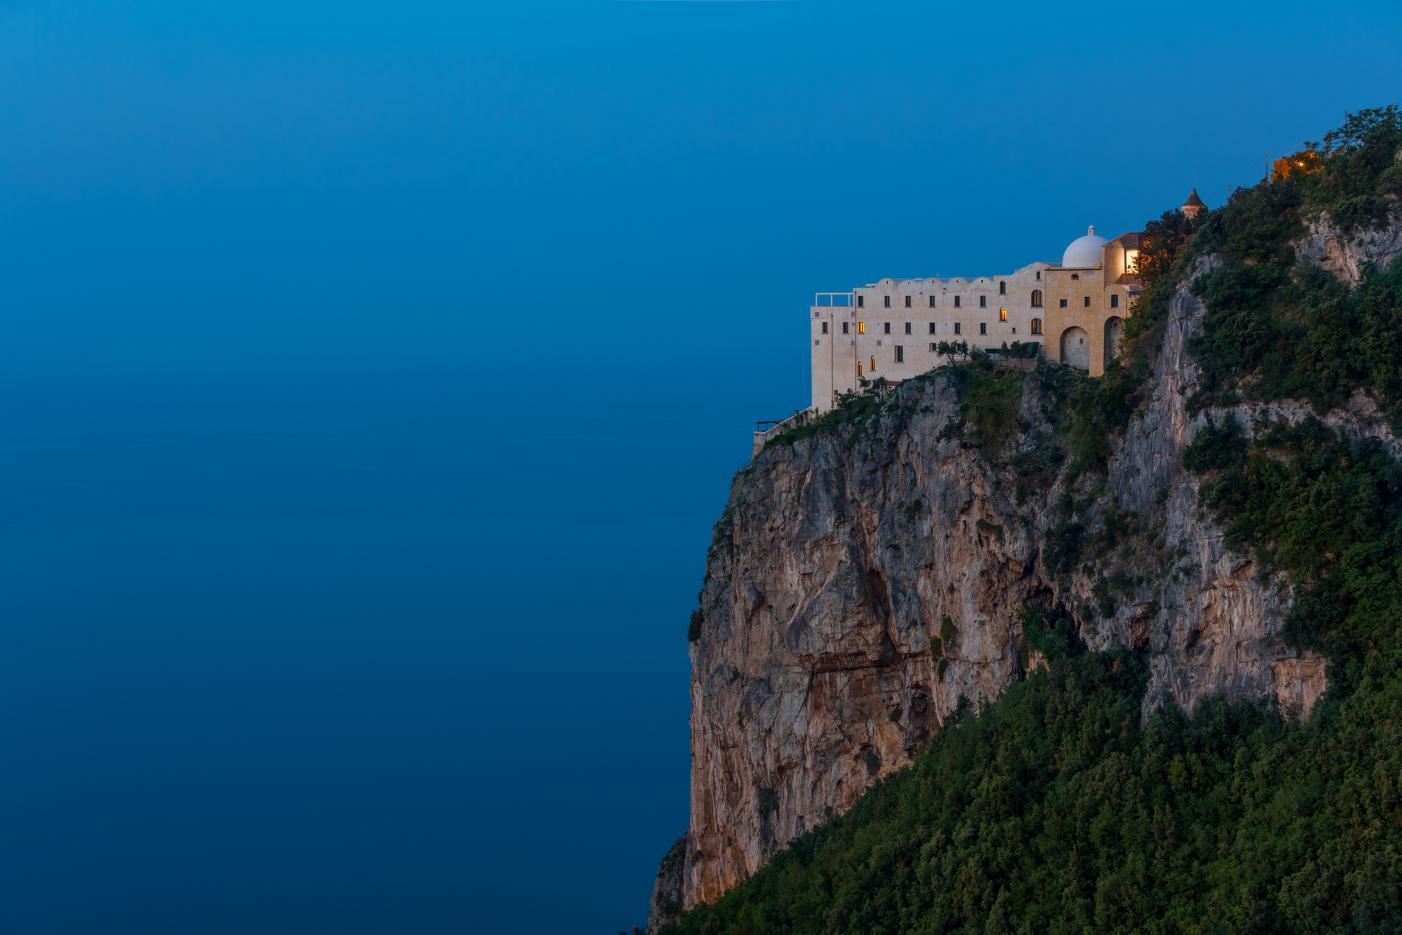 İtalya Monastero Santa Rosa lüks balayı oteli